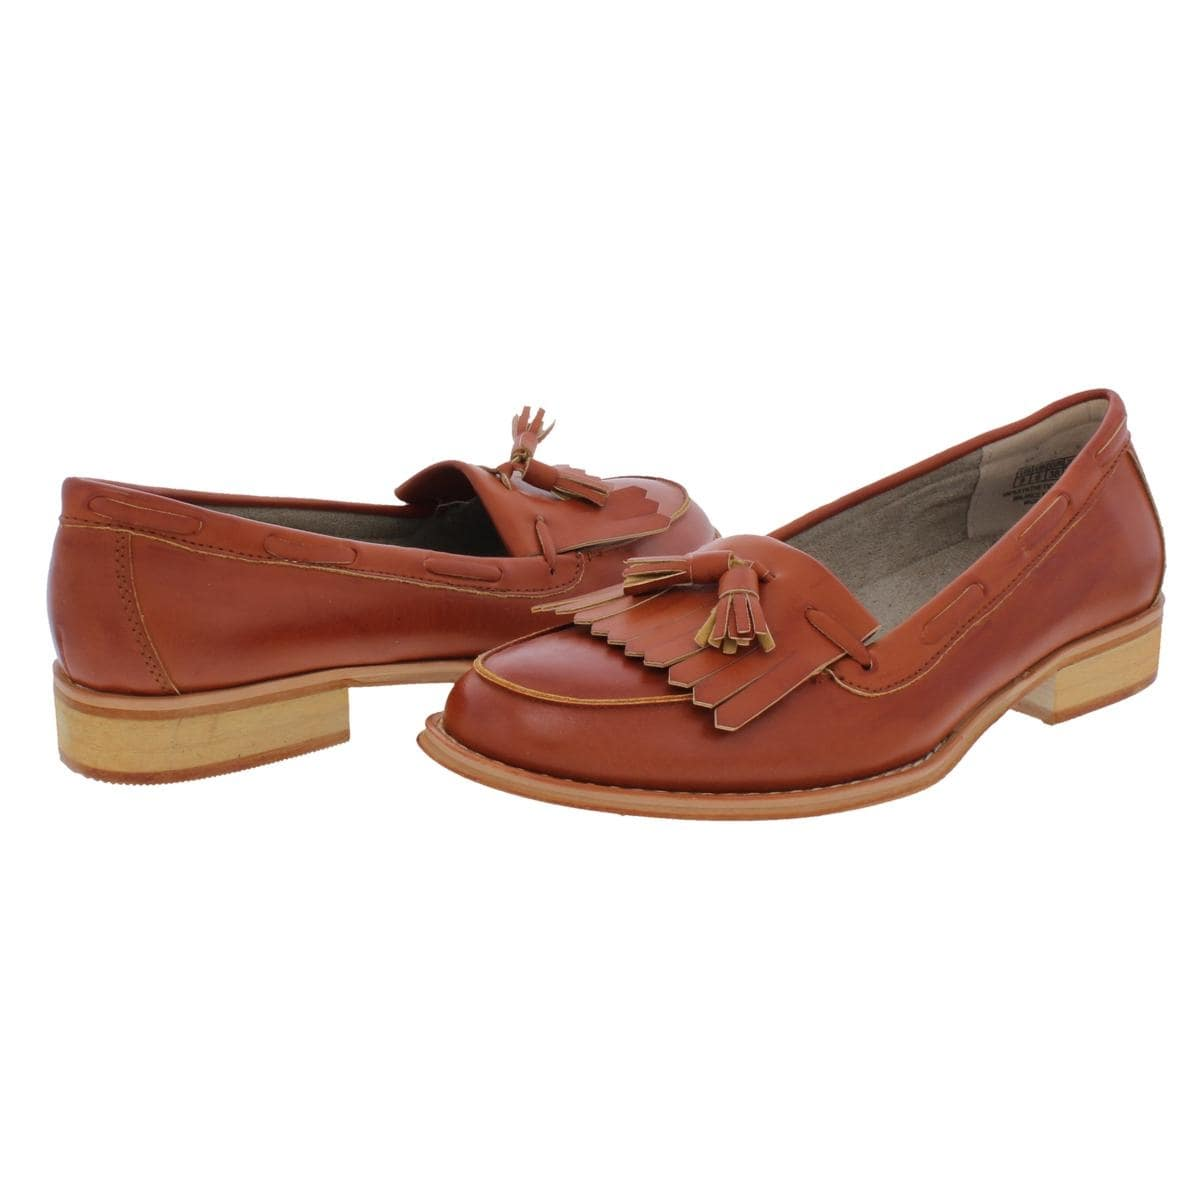 fcf2ecd367f Steve Madden Womens Majorrr Loafers Fringe Faux Leather